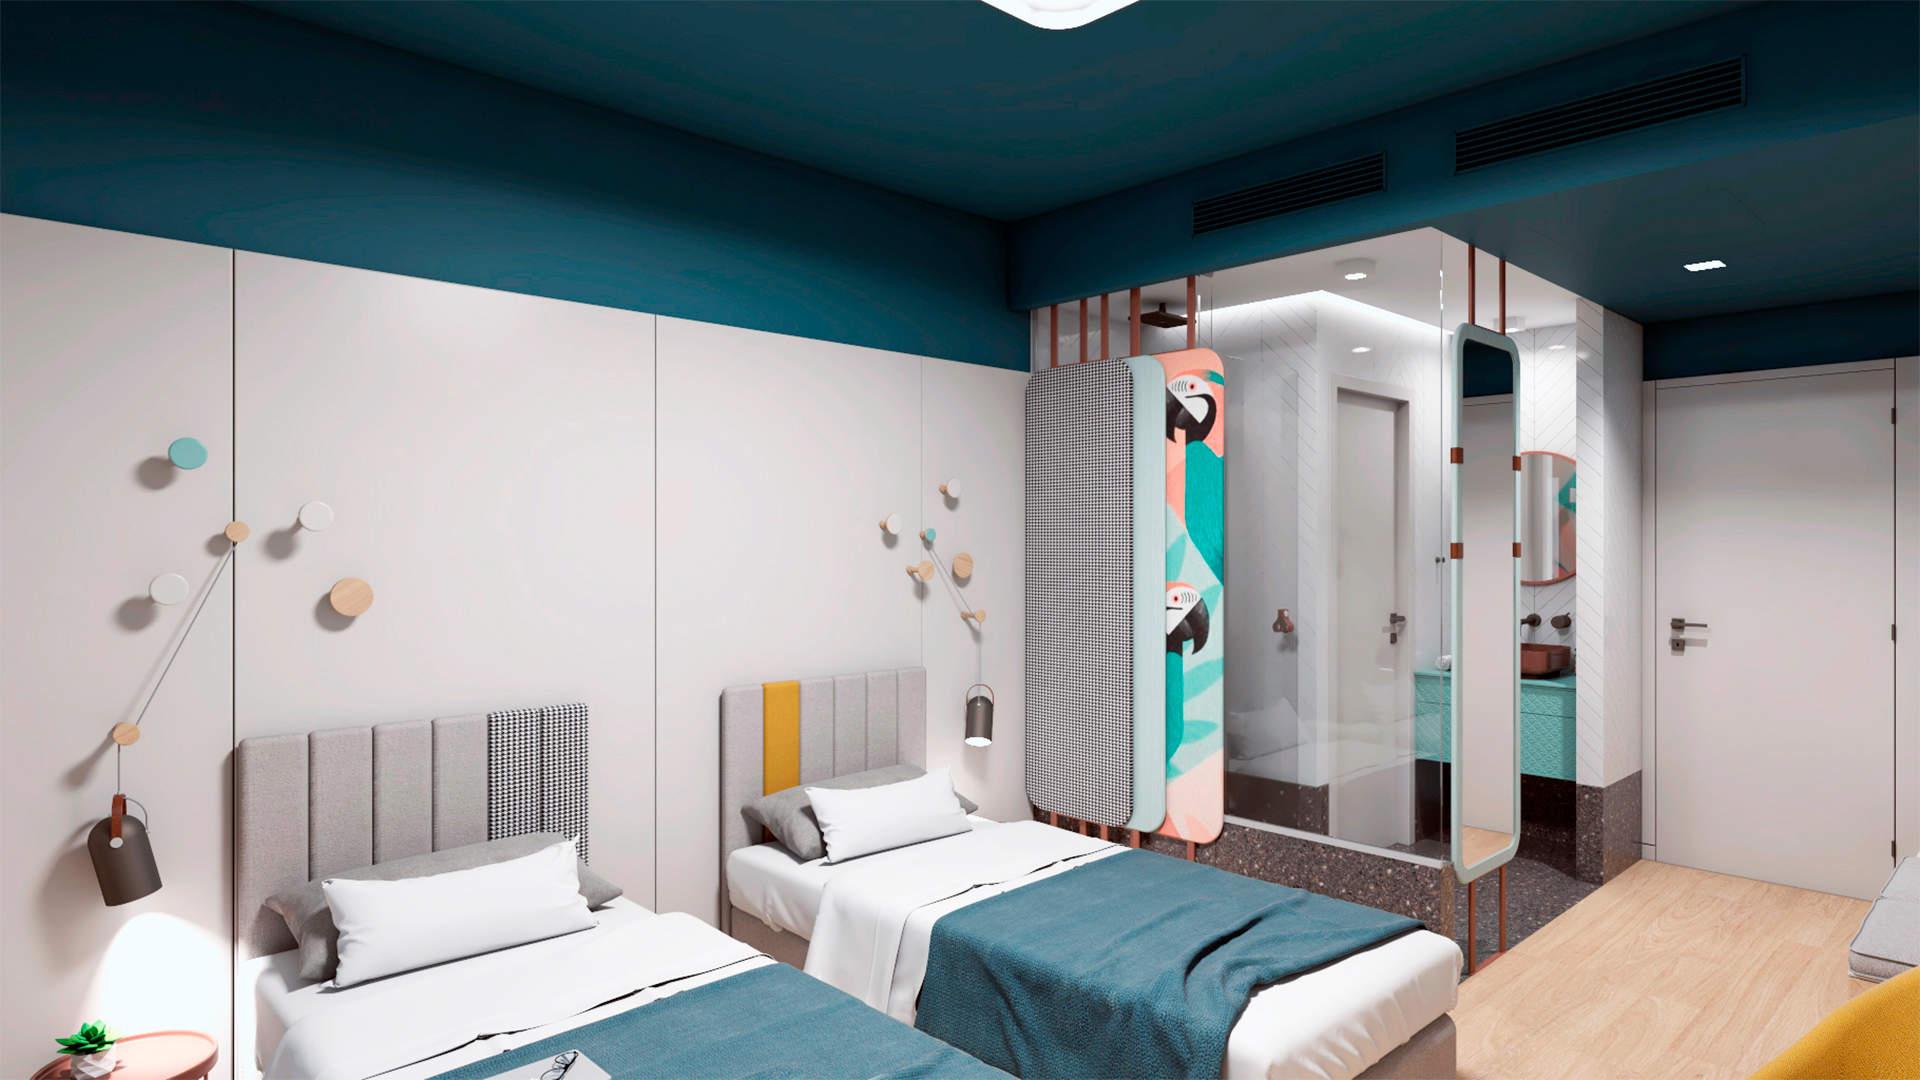 City hotel room, interior design, separate beds and bathroom. Δωμάτιο αστικού ξενοδοχείου, χωριστά κρεβάτια, μπάνιο.